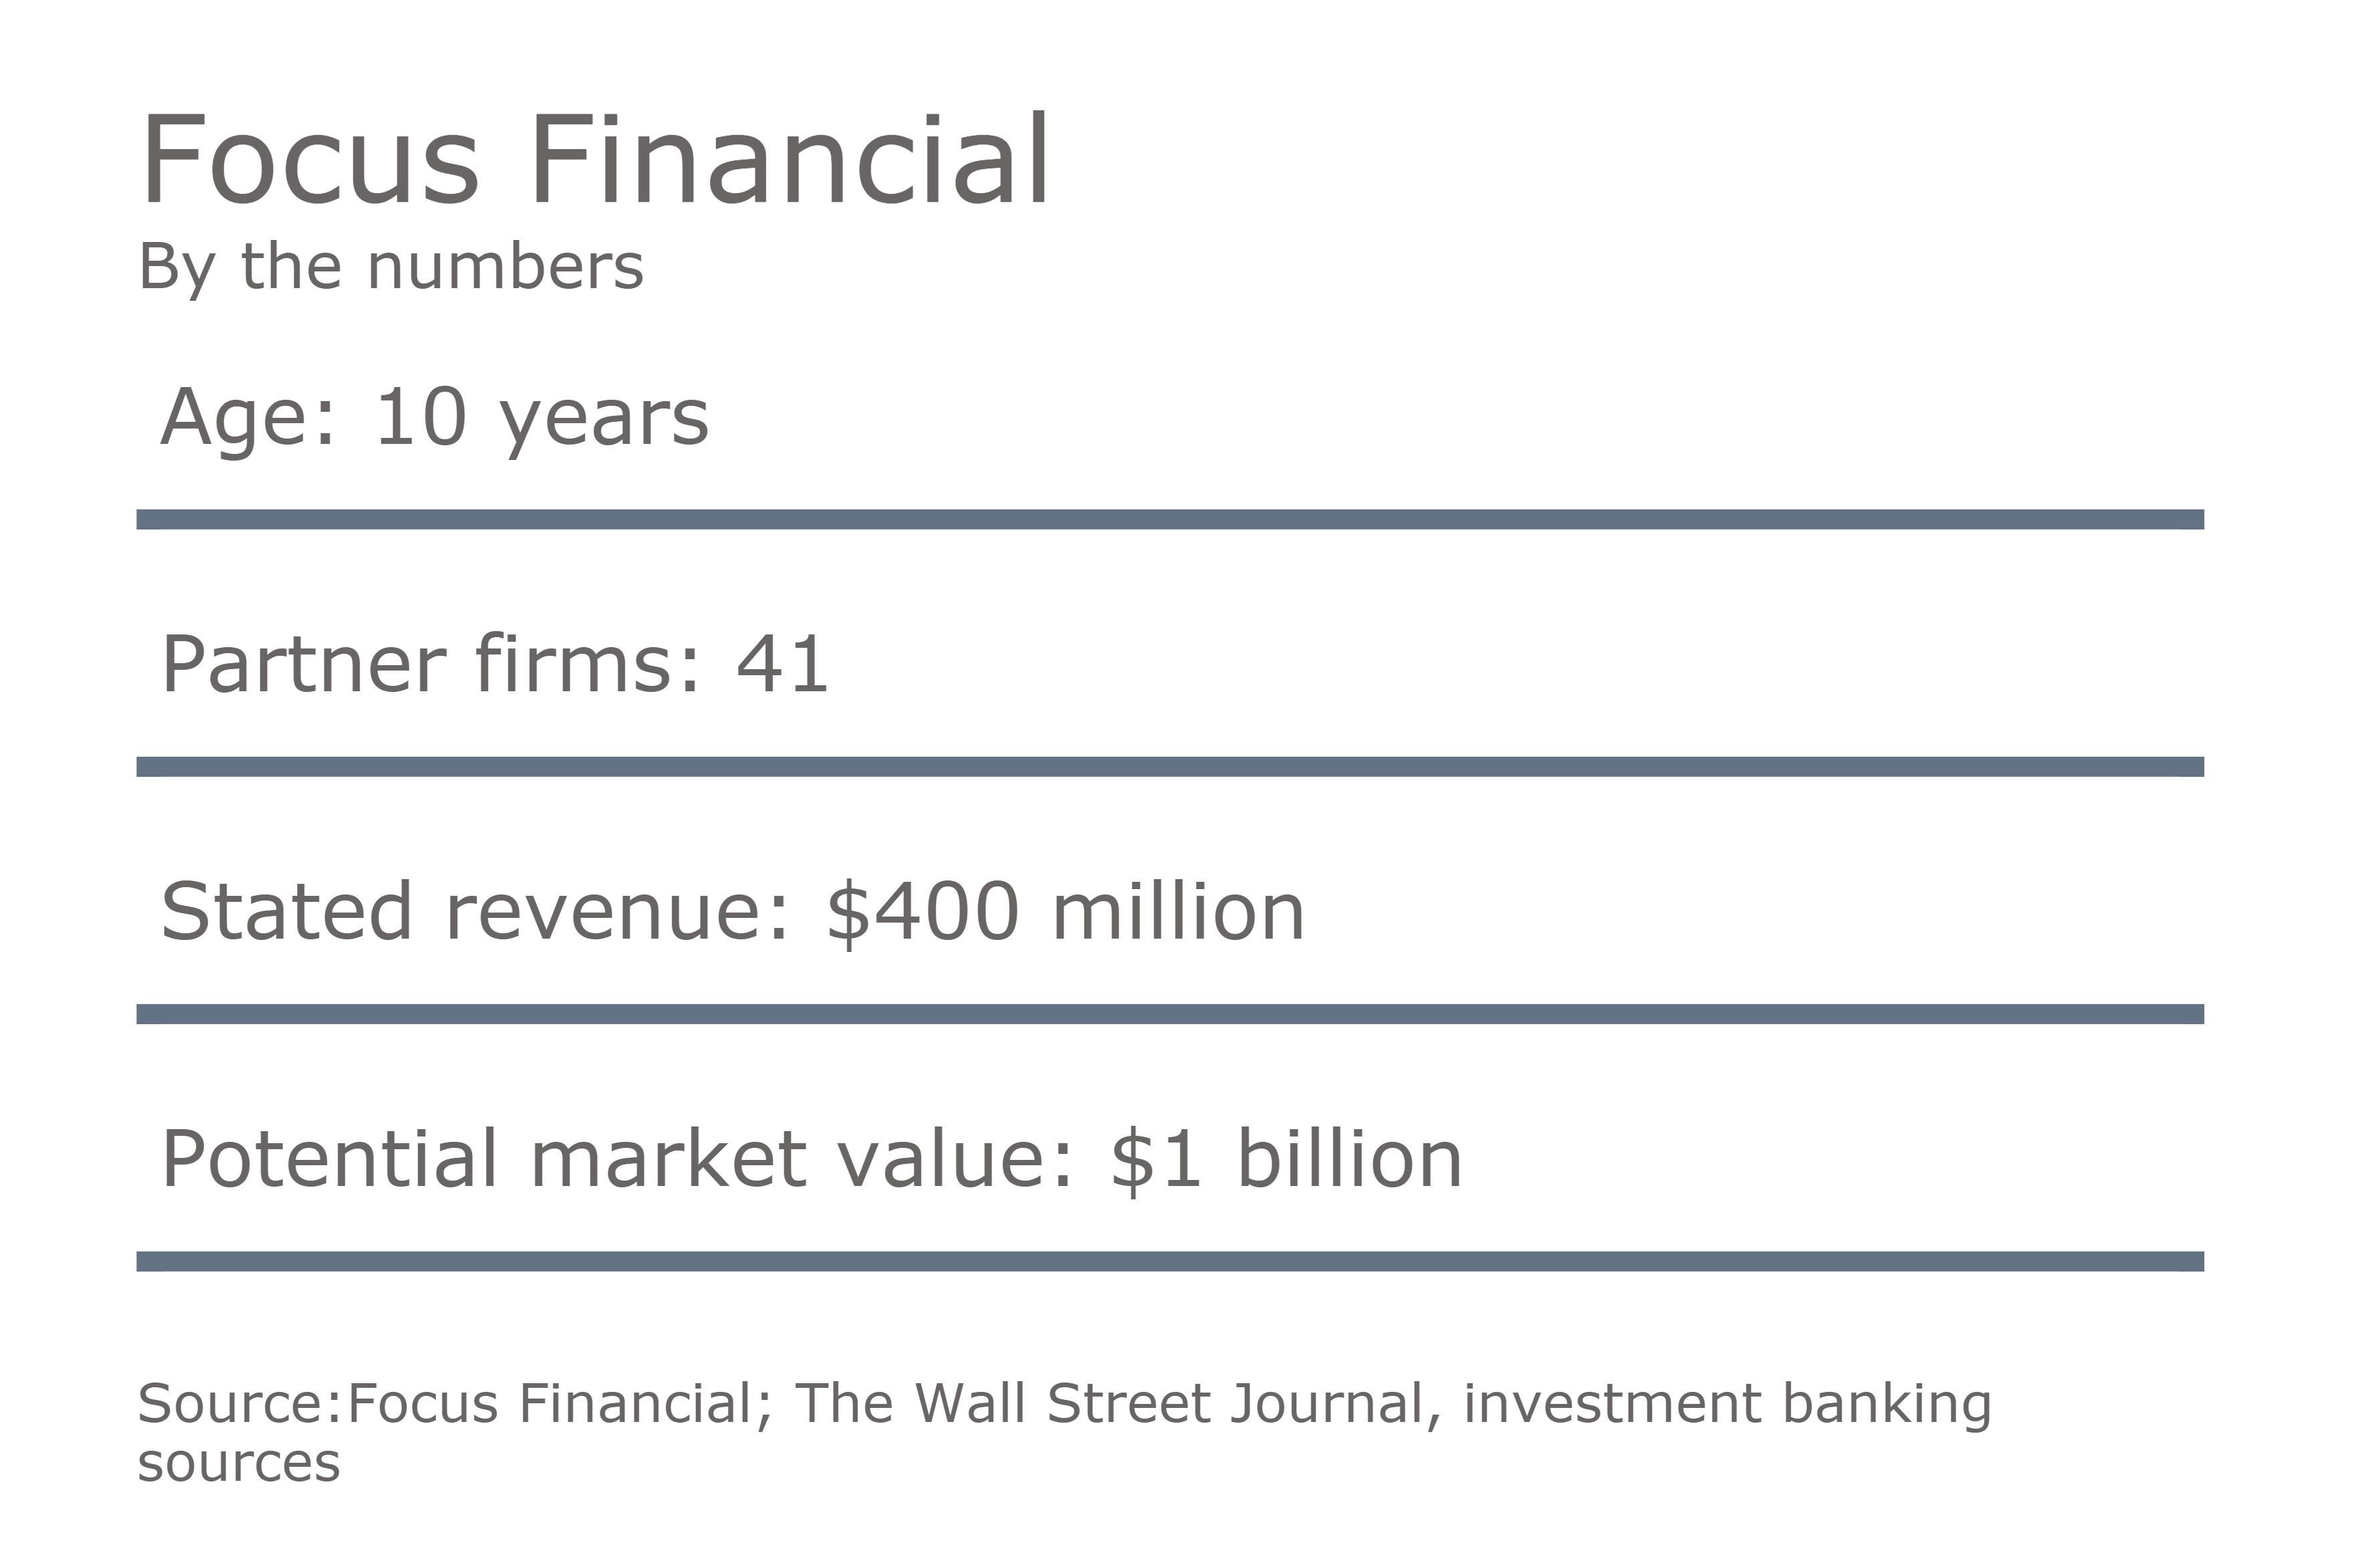 https://assets.sourcemedia.com/af/8a/78d943614be3ae4a7735ac2e00fb/focus-financail-data-graphic-0816.png